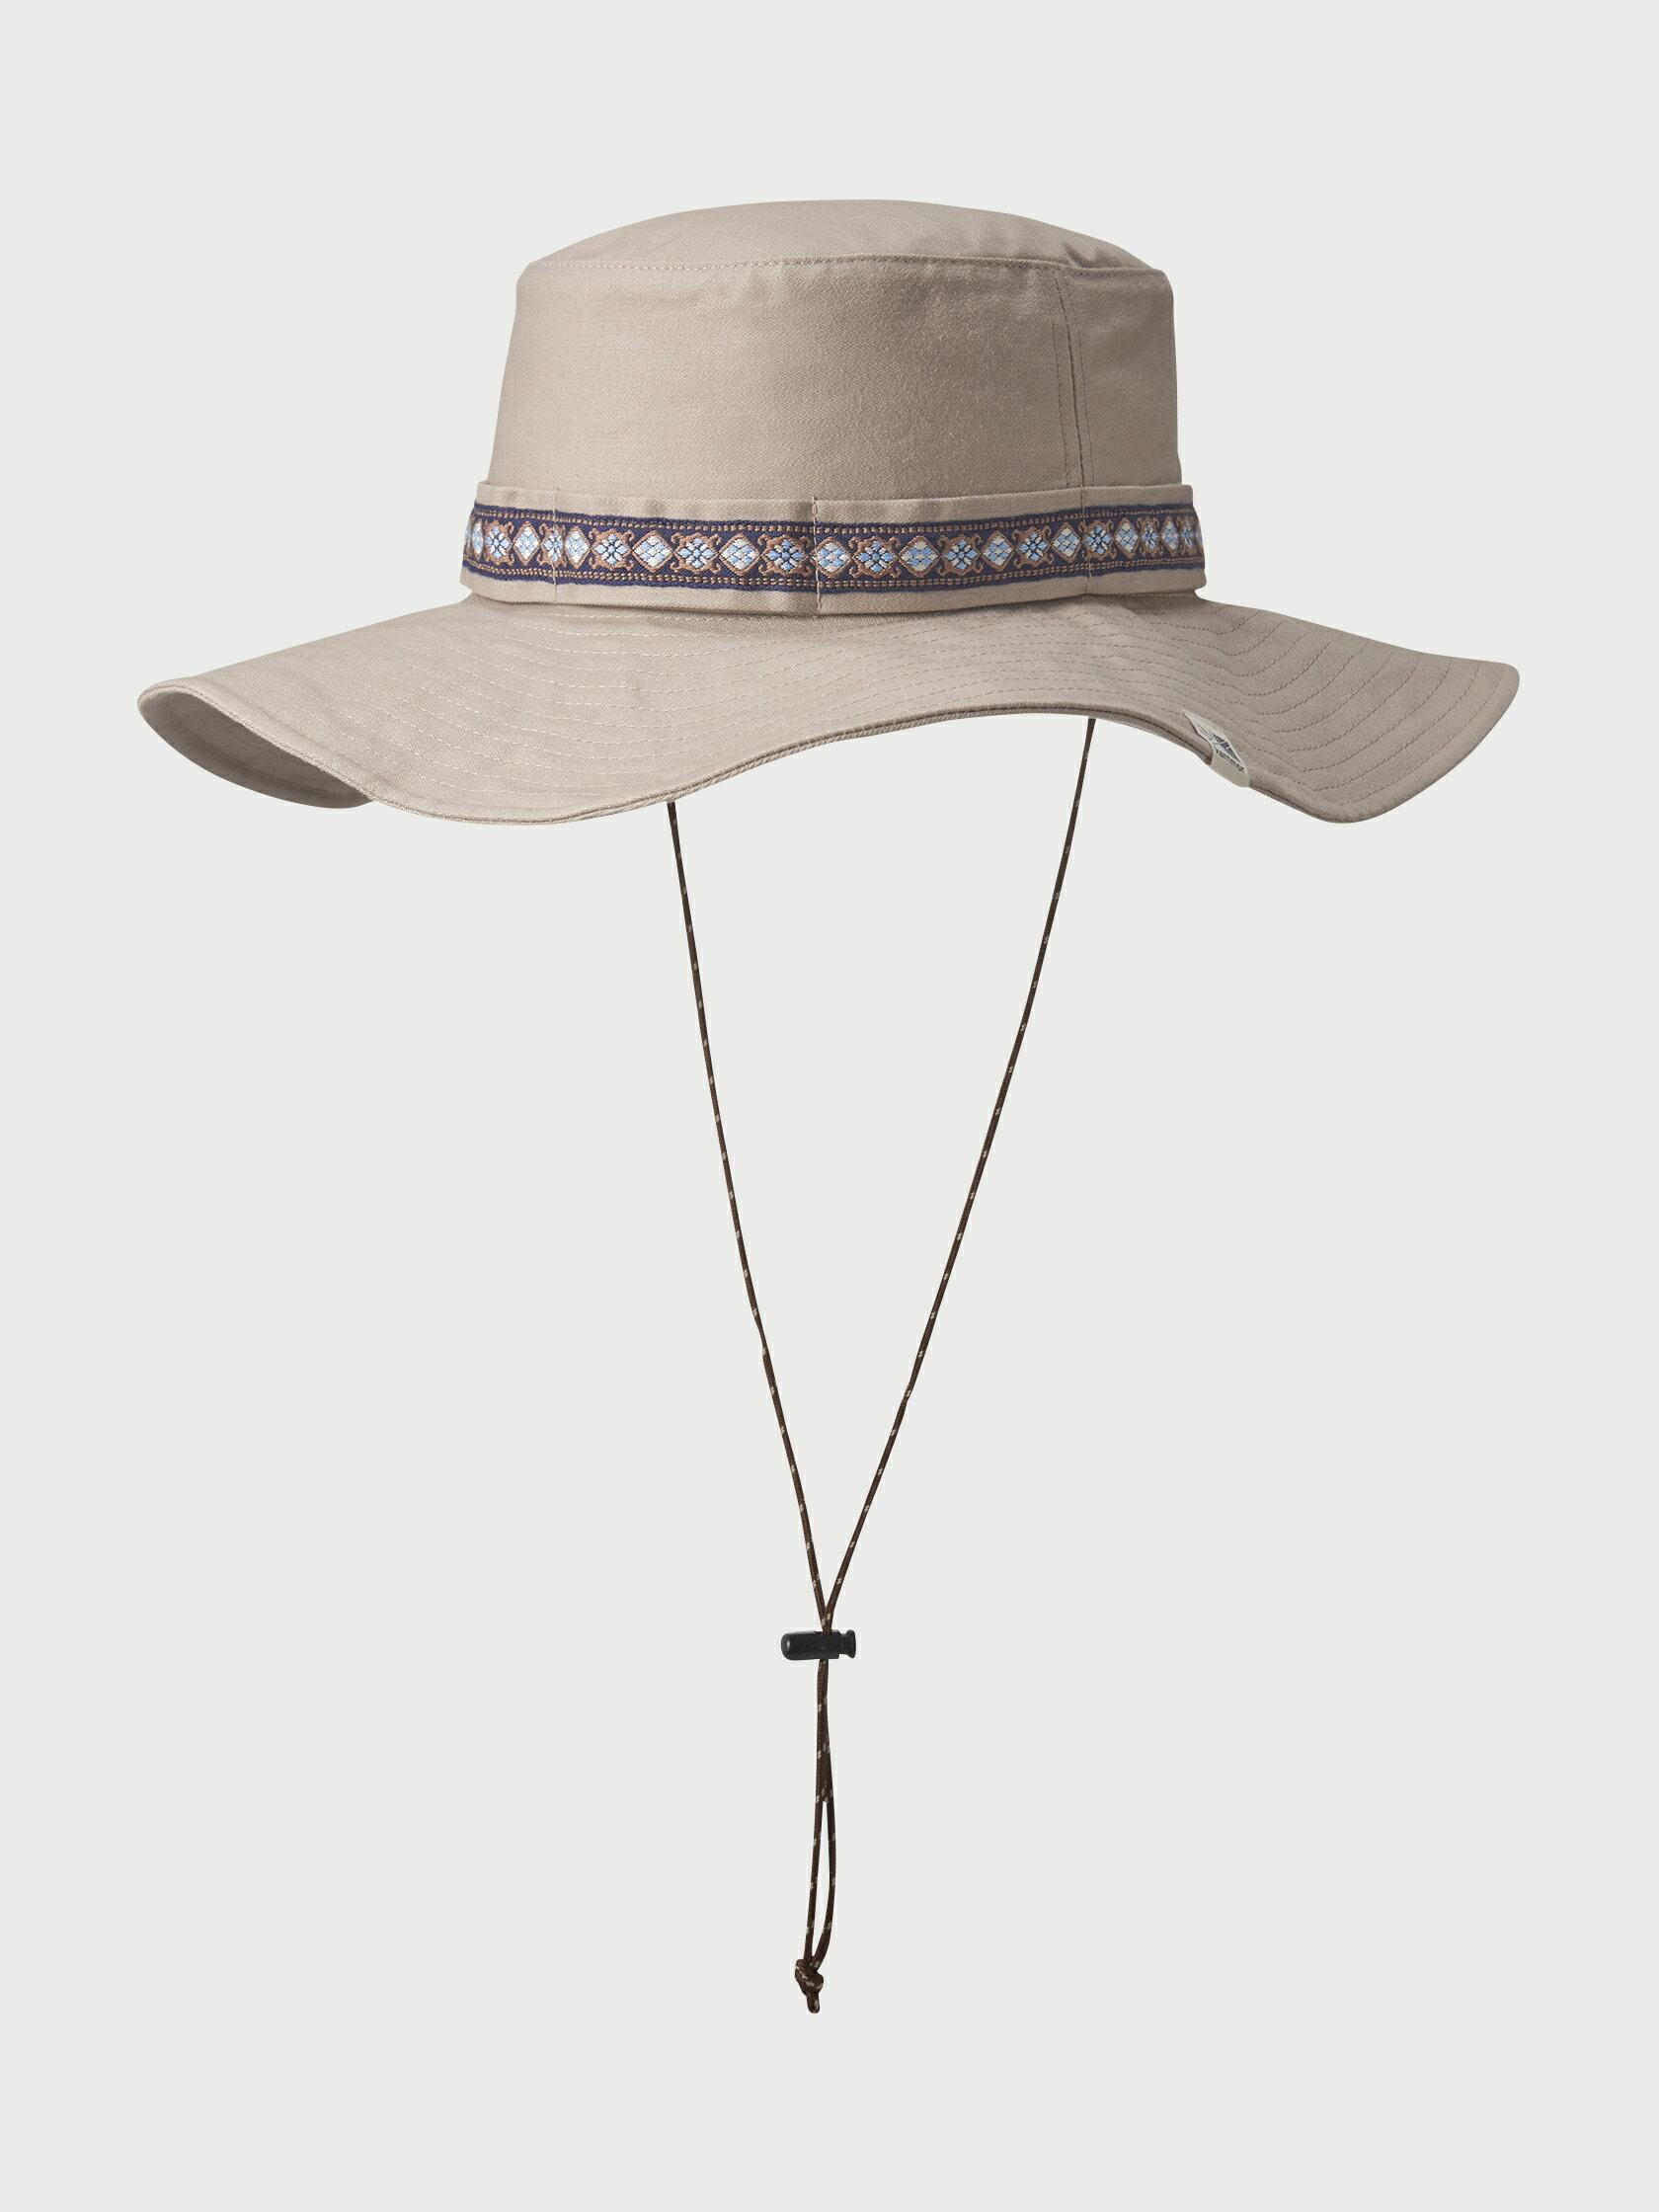 Karrimor Safari Hat 遮陽圓盤帽/遮陽帽 Safari Hat 5H10UBJ2 101077 Beige 米黃